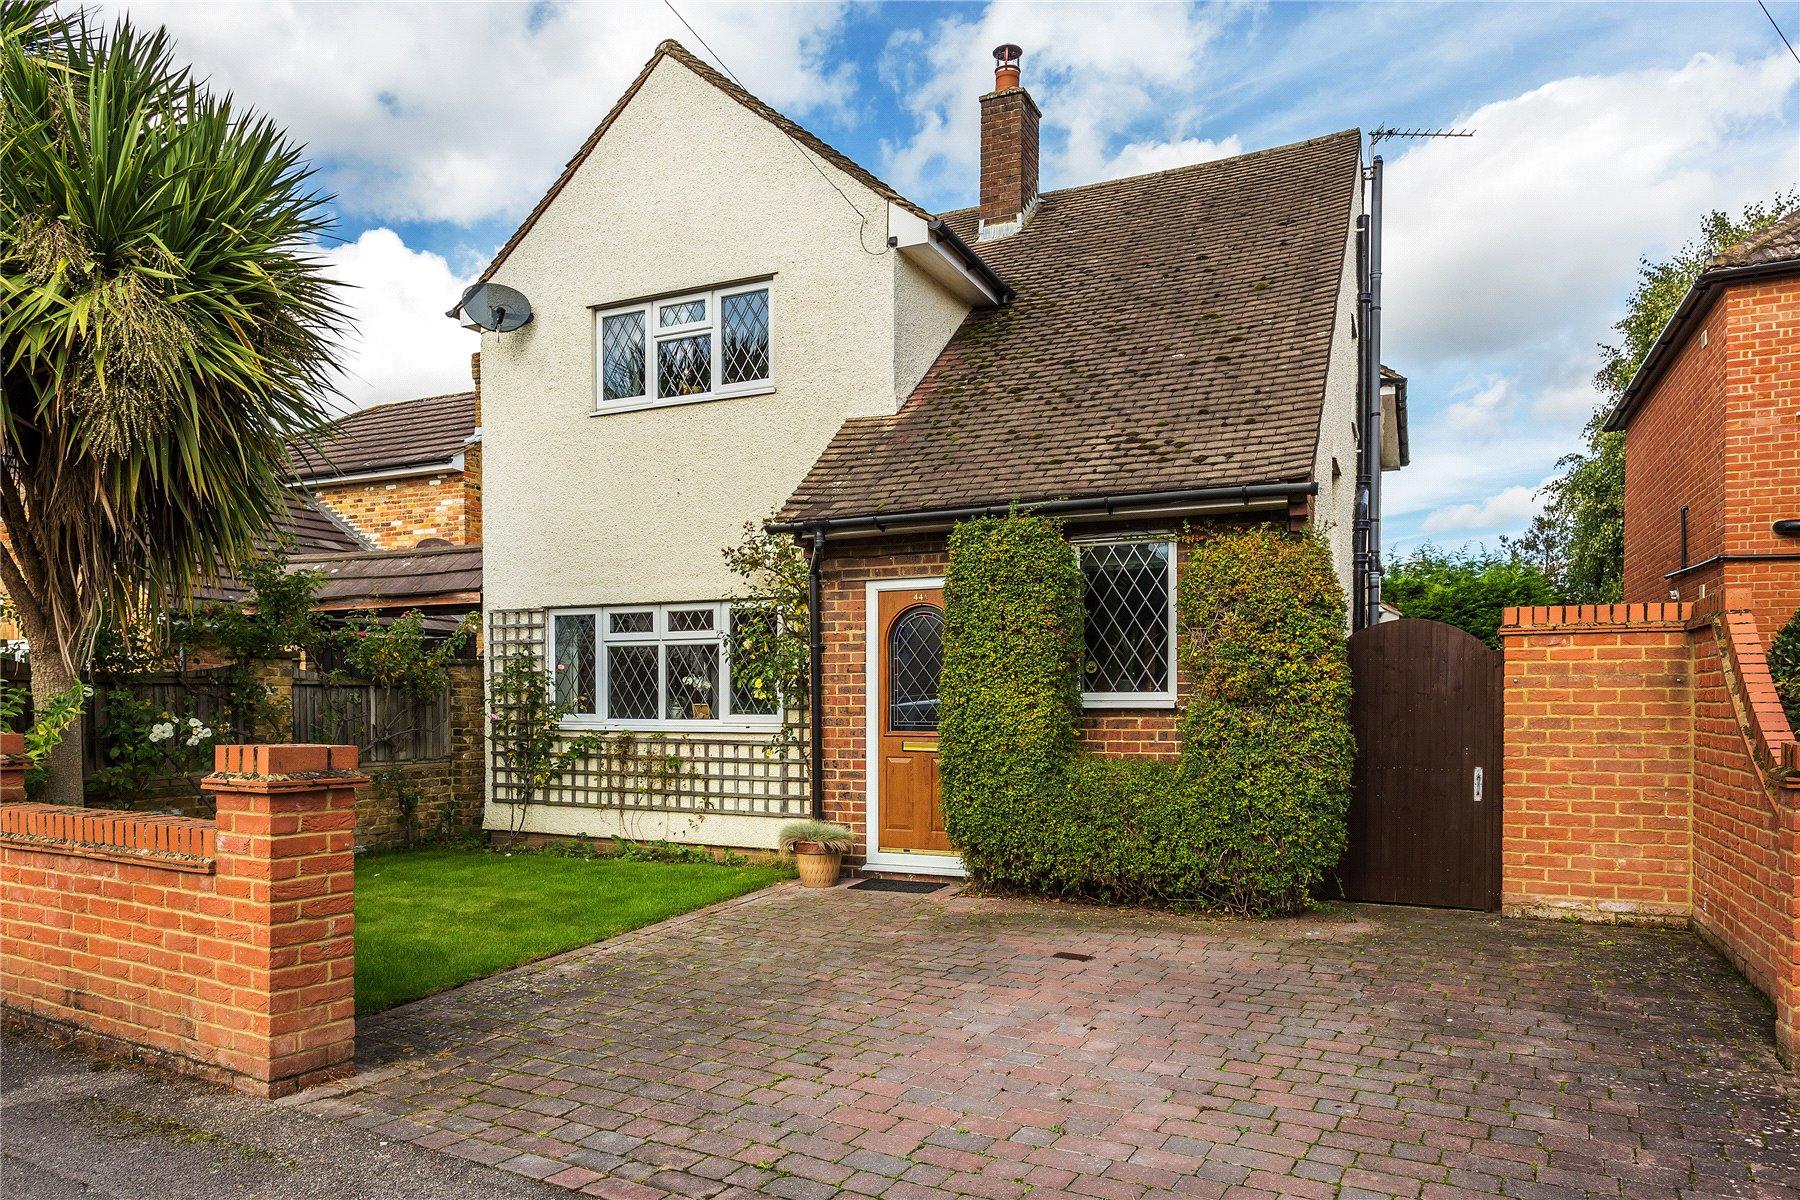 3 Bedrooms House for sale in Grove Road, Chertsey, Surrey, KT16